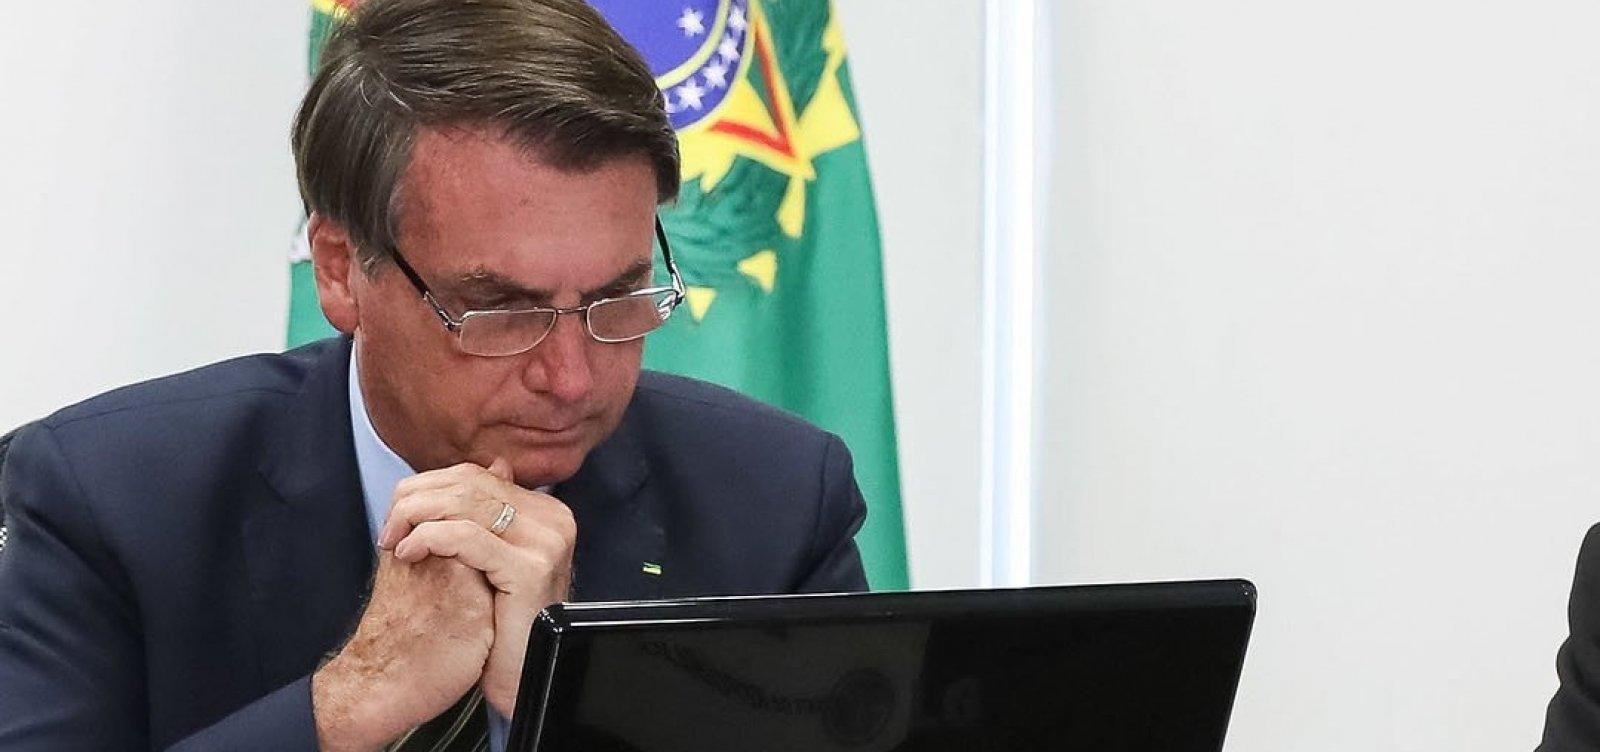 [Instagram oculta post de Bolsonaro com fake news sobre coronavírus]